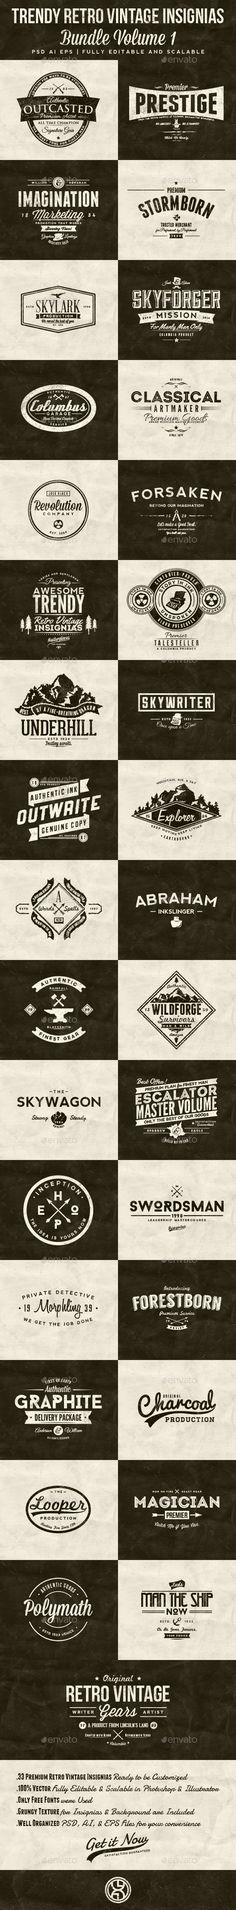 33 Trendy Retro Vintage Insignias Bundle Volume 1 — Photoshop PSD #weathered #vintage logo • Available here → https://graphicriver.net/item/33-trendy-retro-vintage-insignias-bundle-volume-1/7522214?ref=pxcr